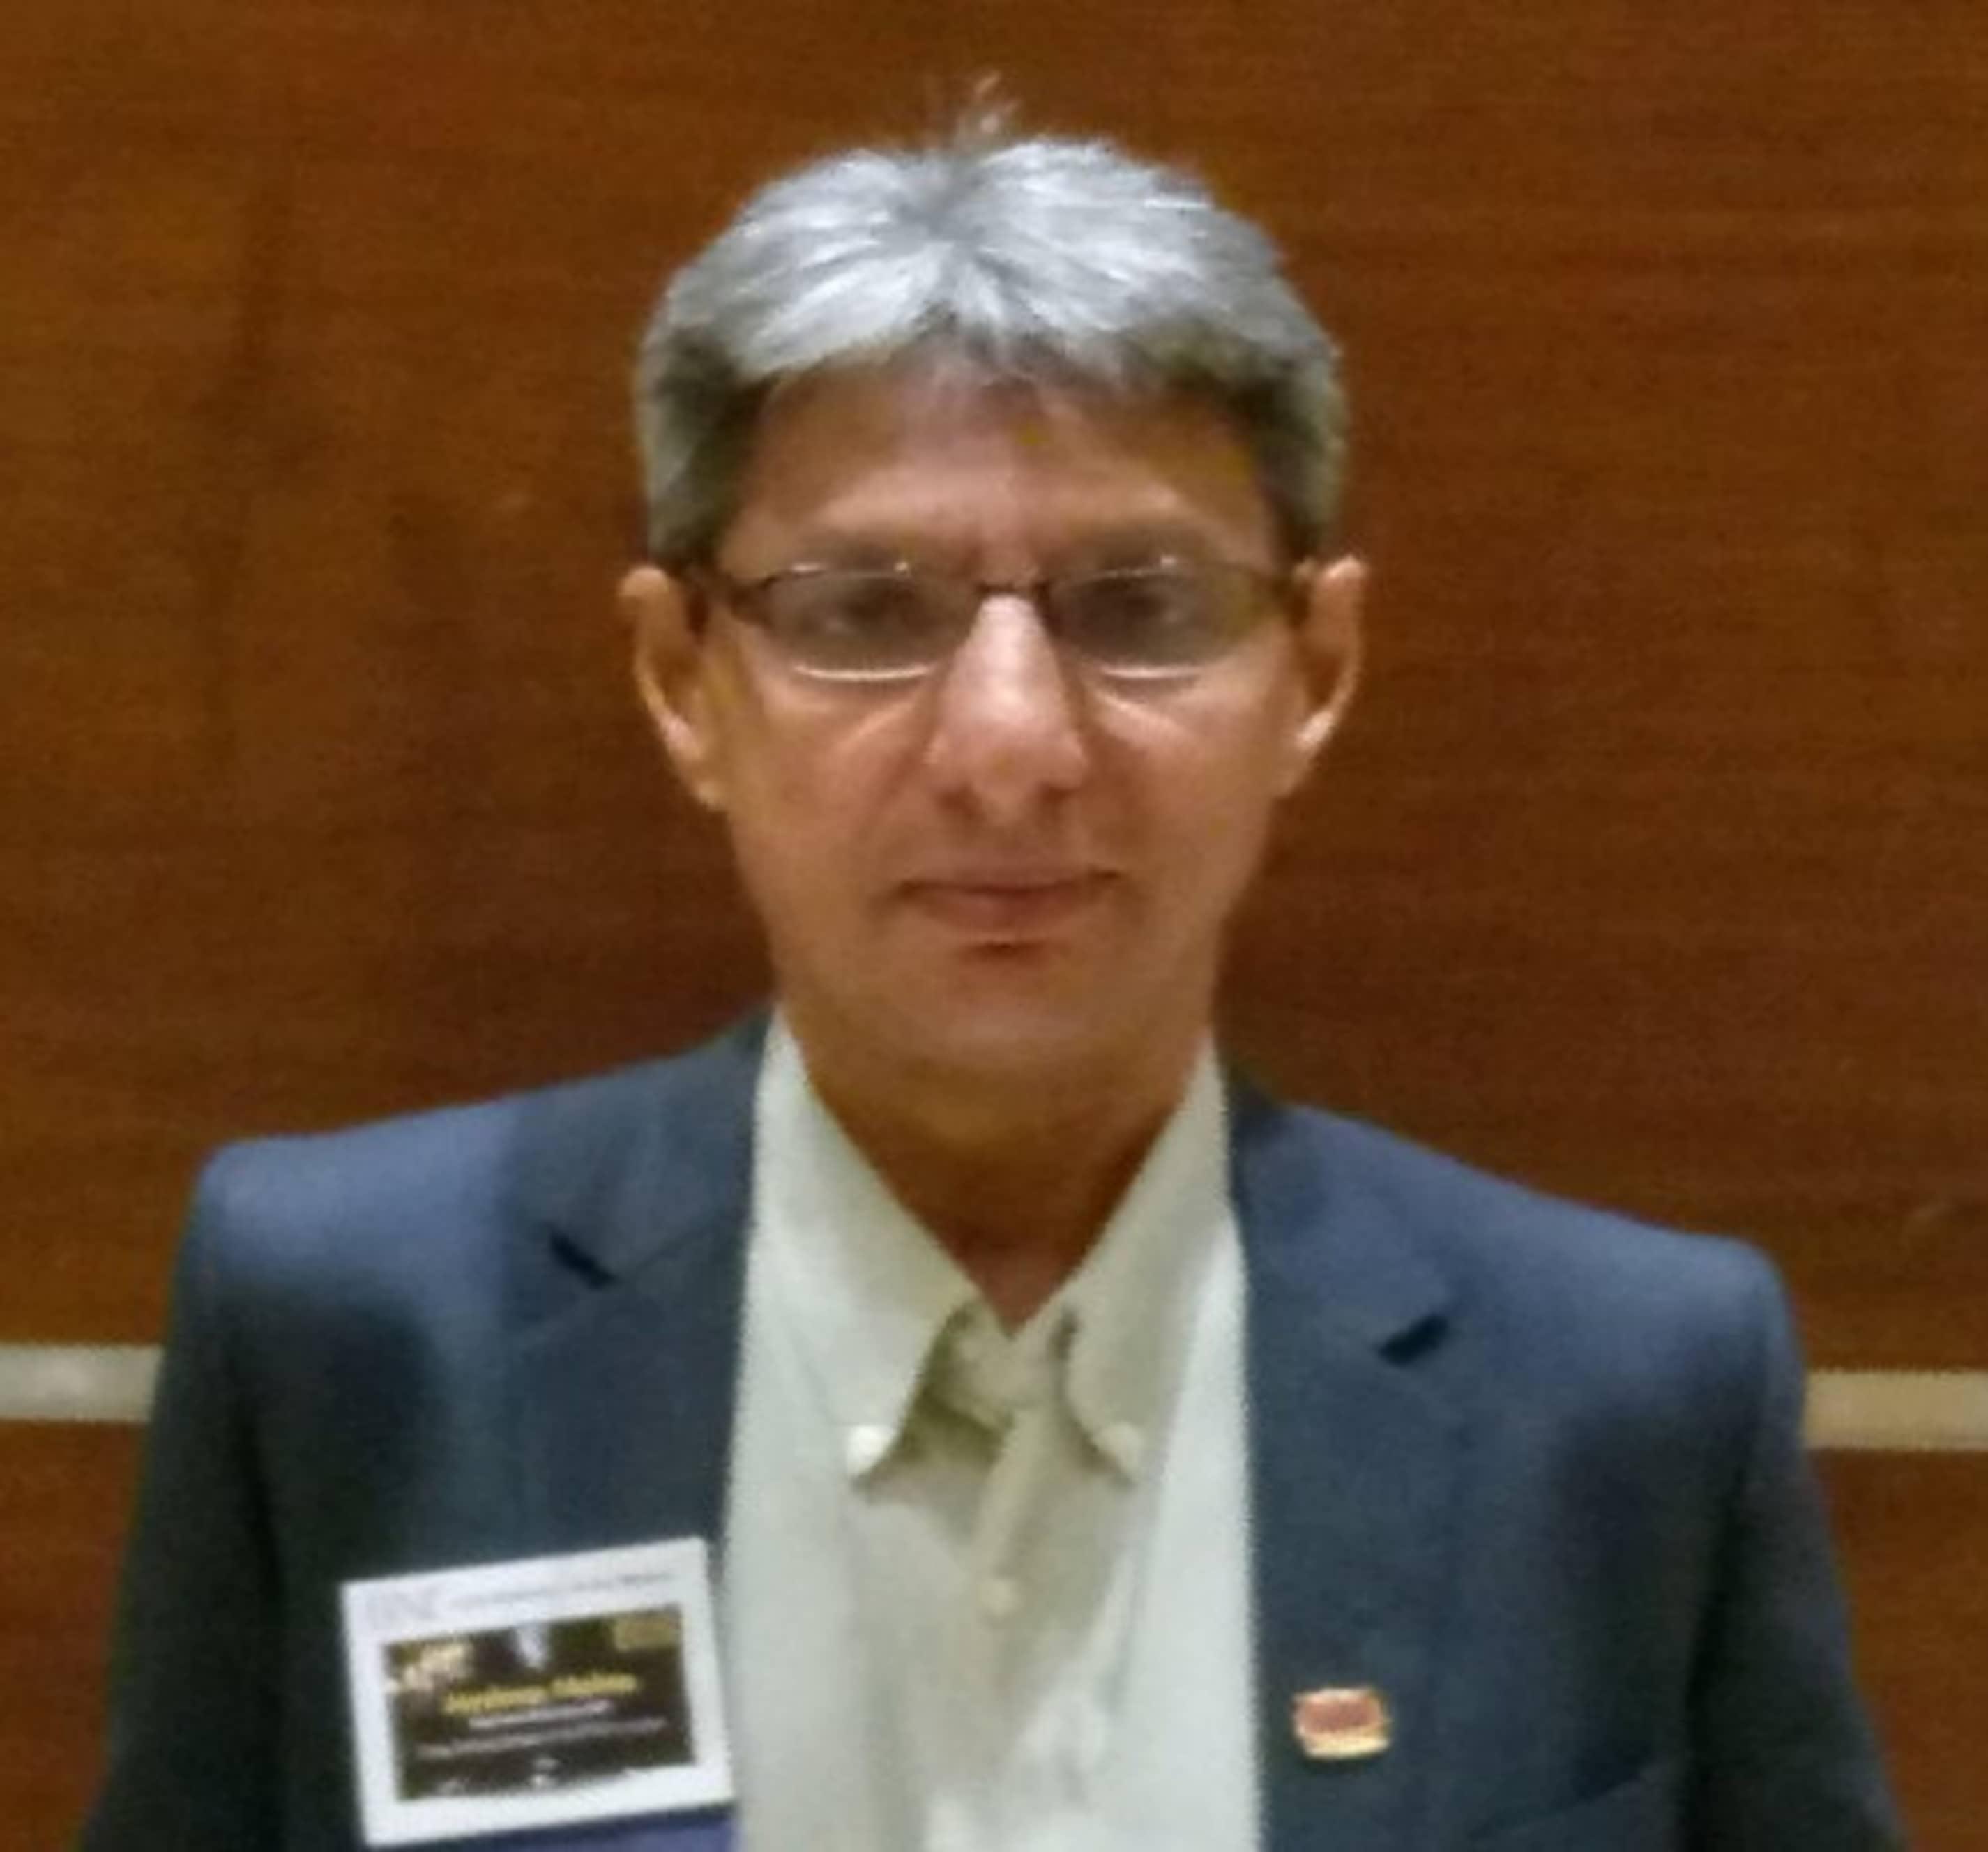 Adv. Jaydeep Mehta